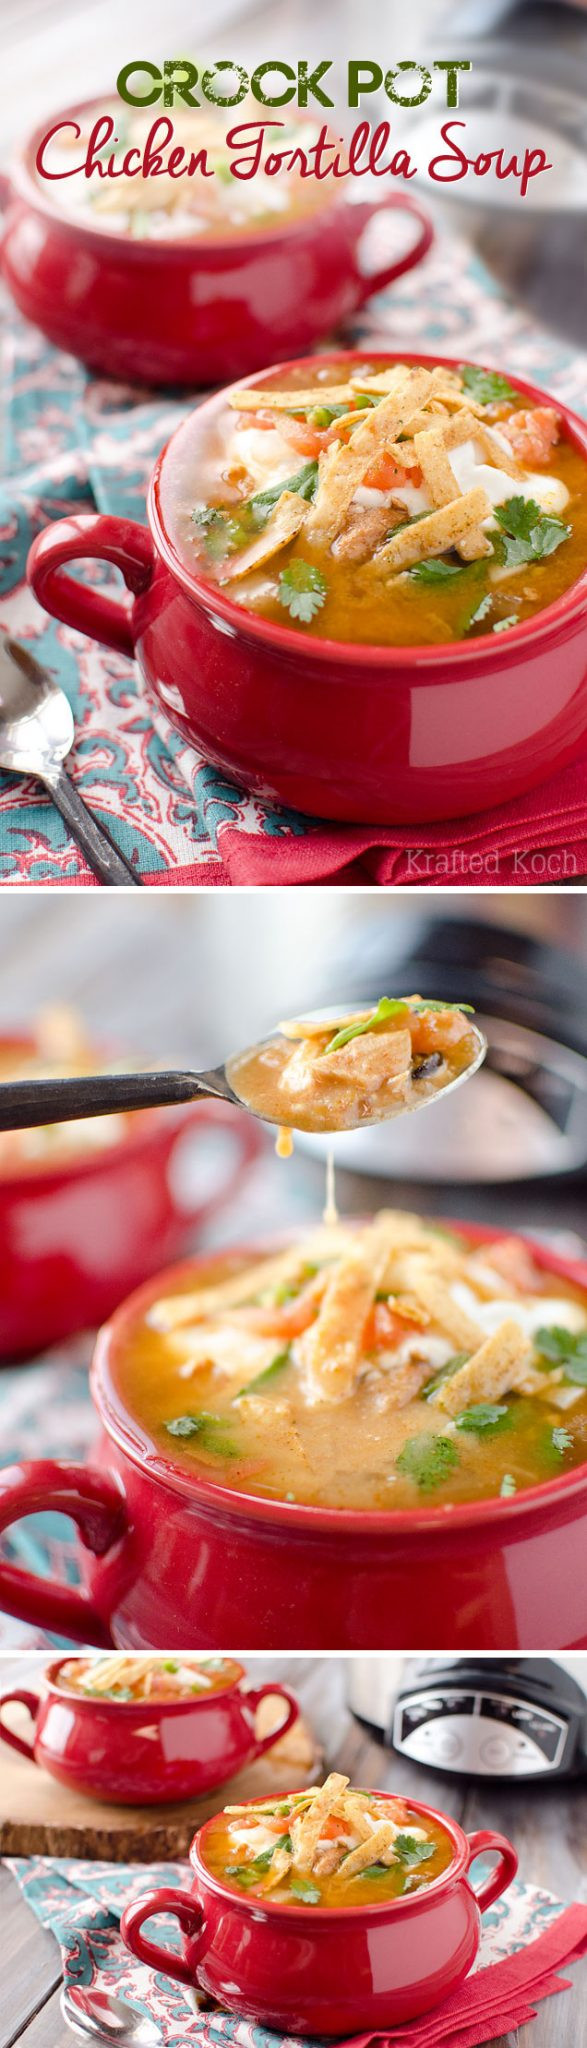 Healthy Chicken Tortilla Soup Crock Pot  Crock Pot Chicken Tortilla Soup